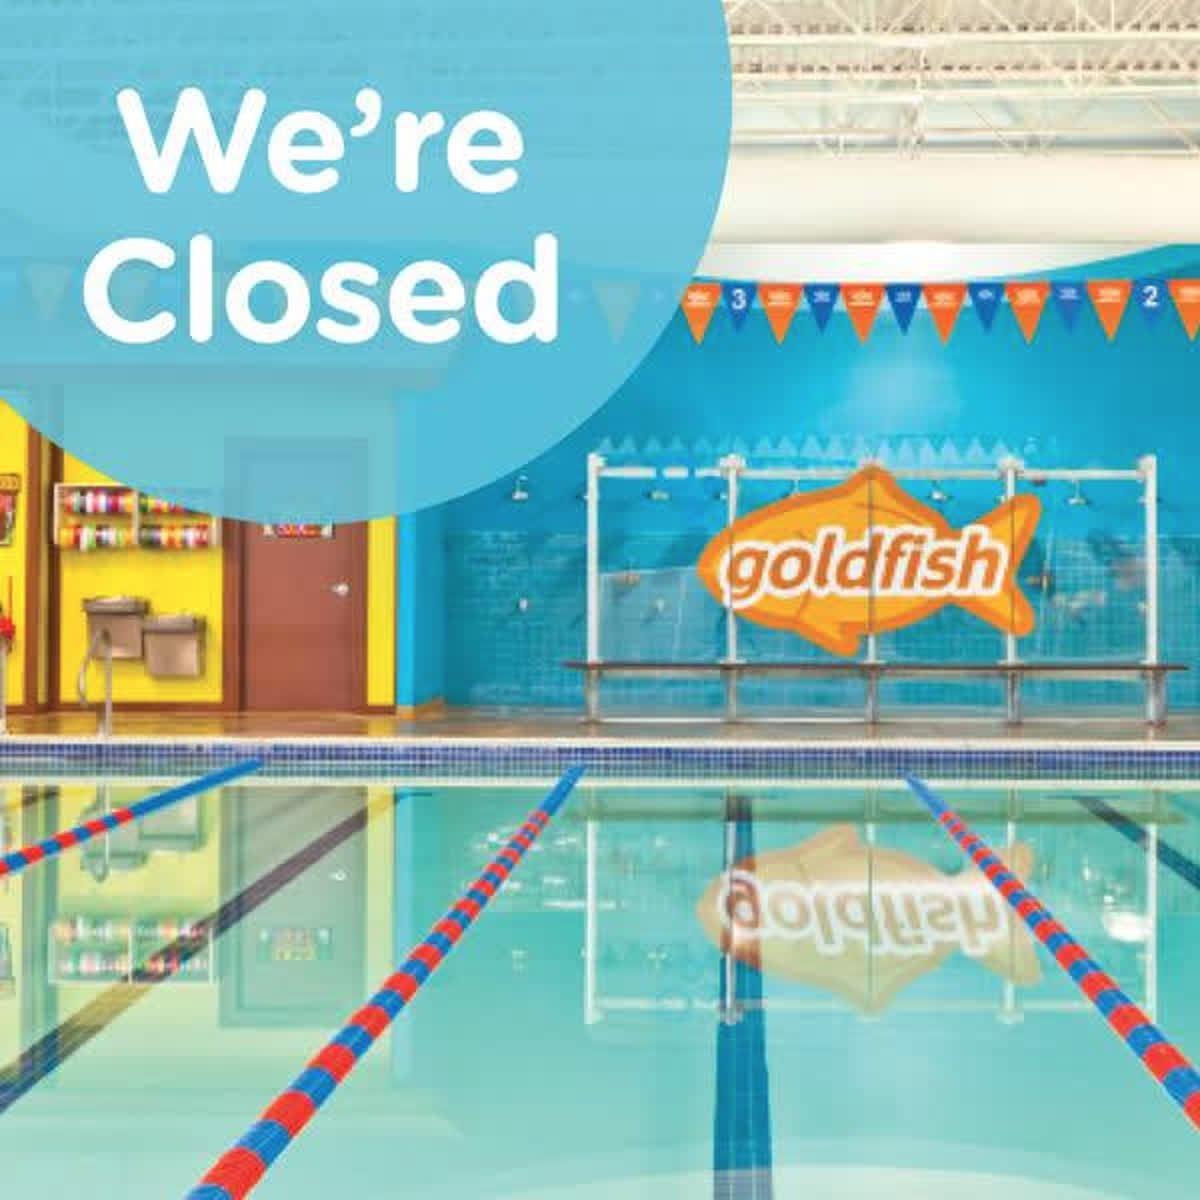 Goldfish Swim School At Goldfishswim Twitter